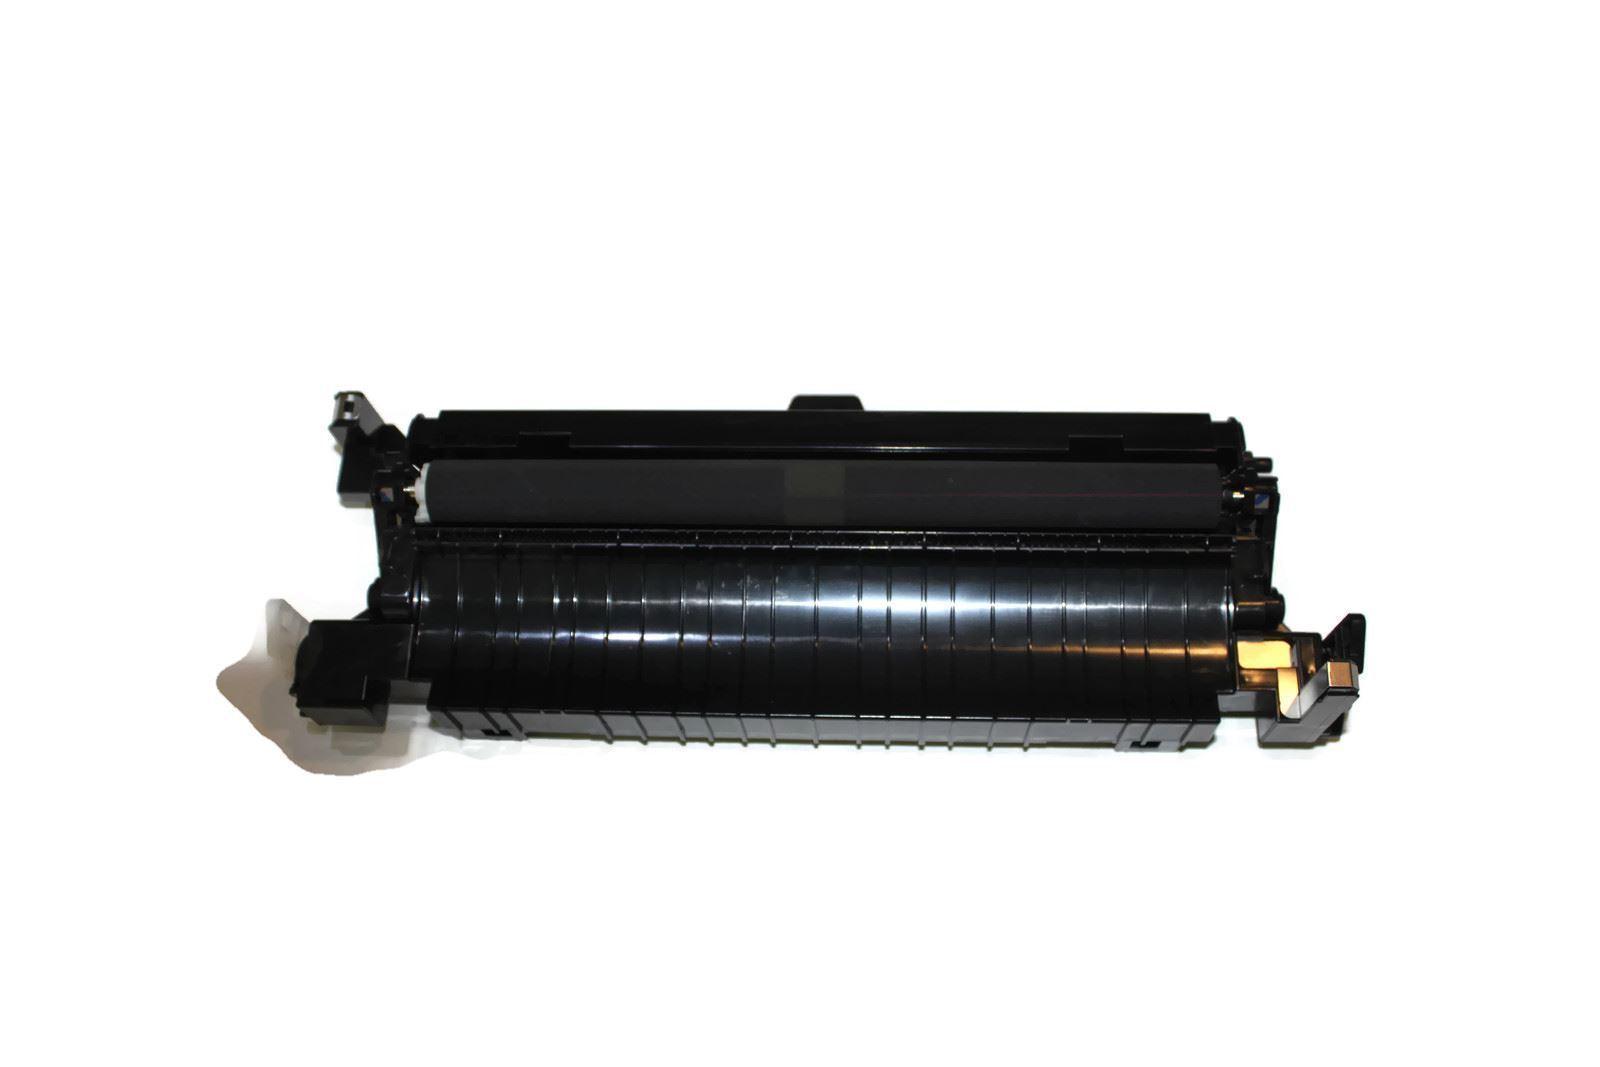 GENUINE Samsung CLP-415NW CLX-4195FW Paper Tray NEW